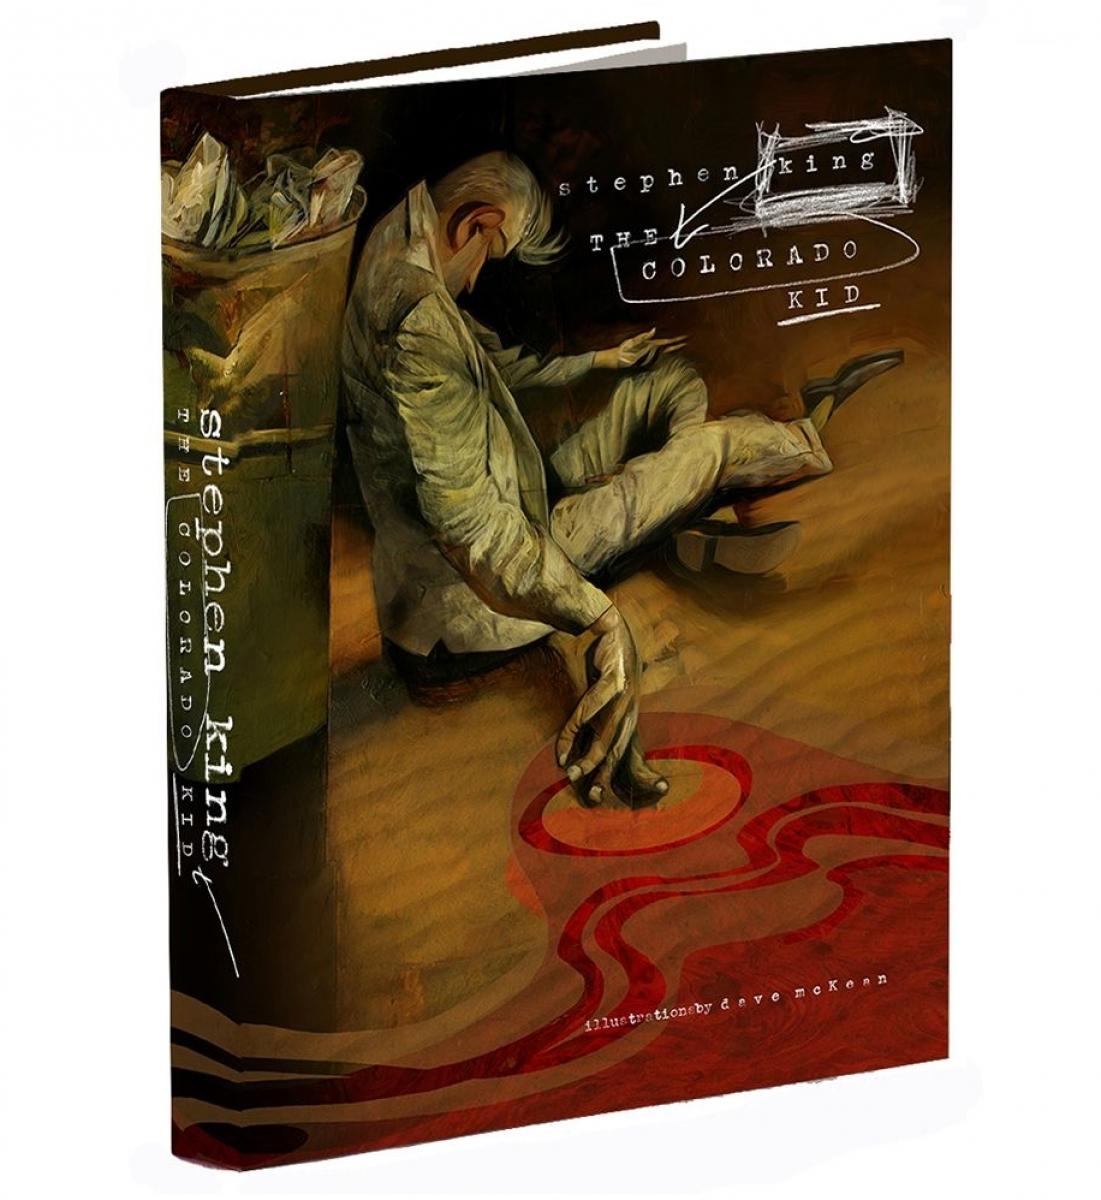 """The Colorado Kid"" - PS Publishing - Regular Trade Edition - obrazek"